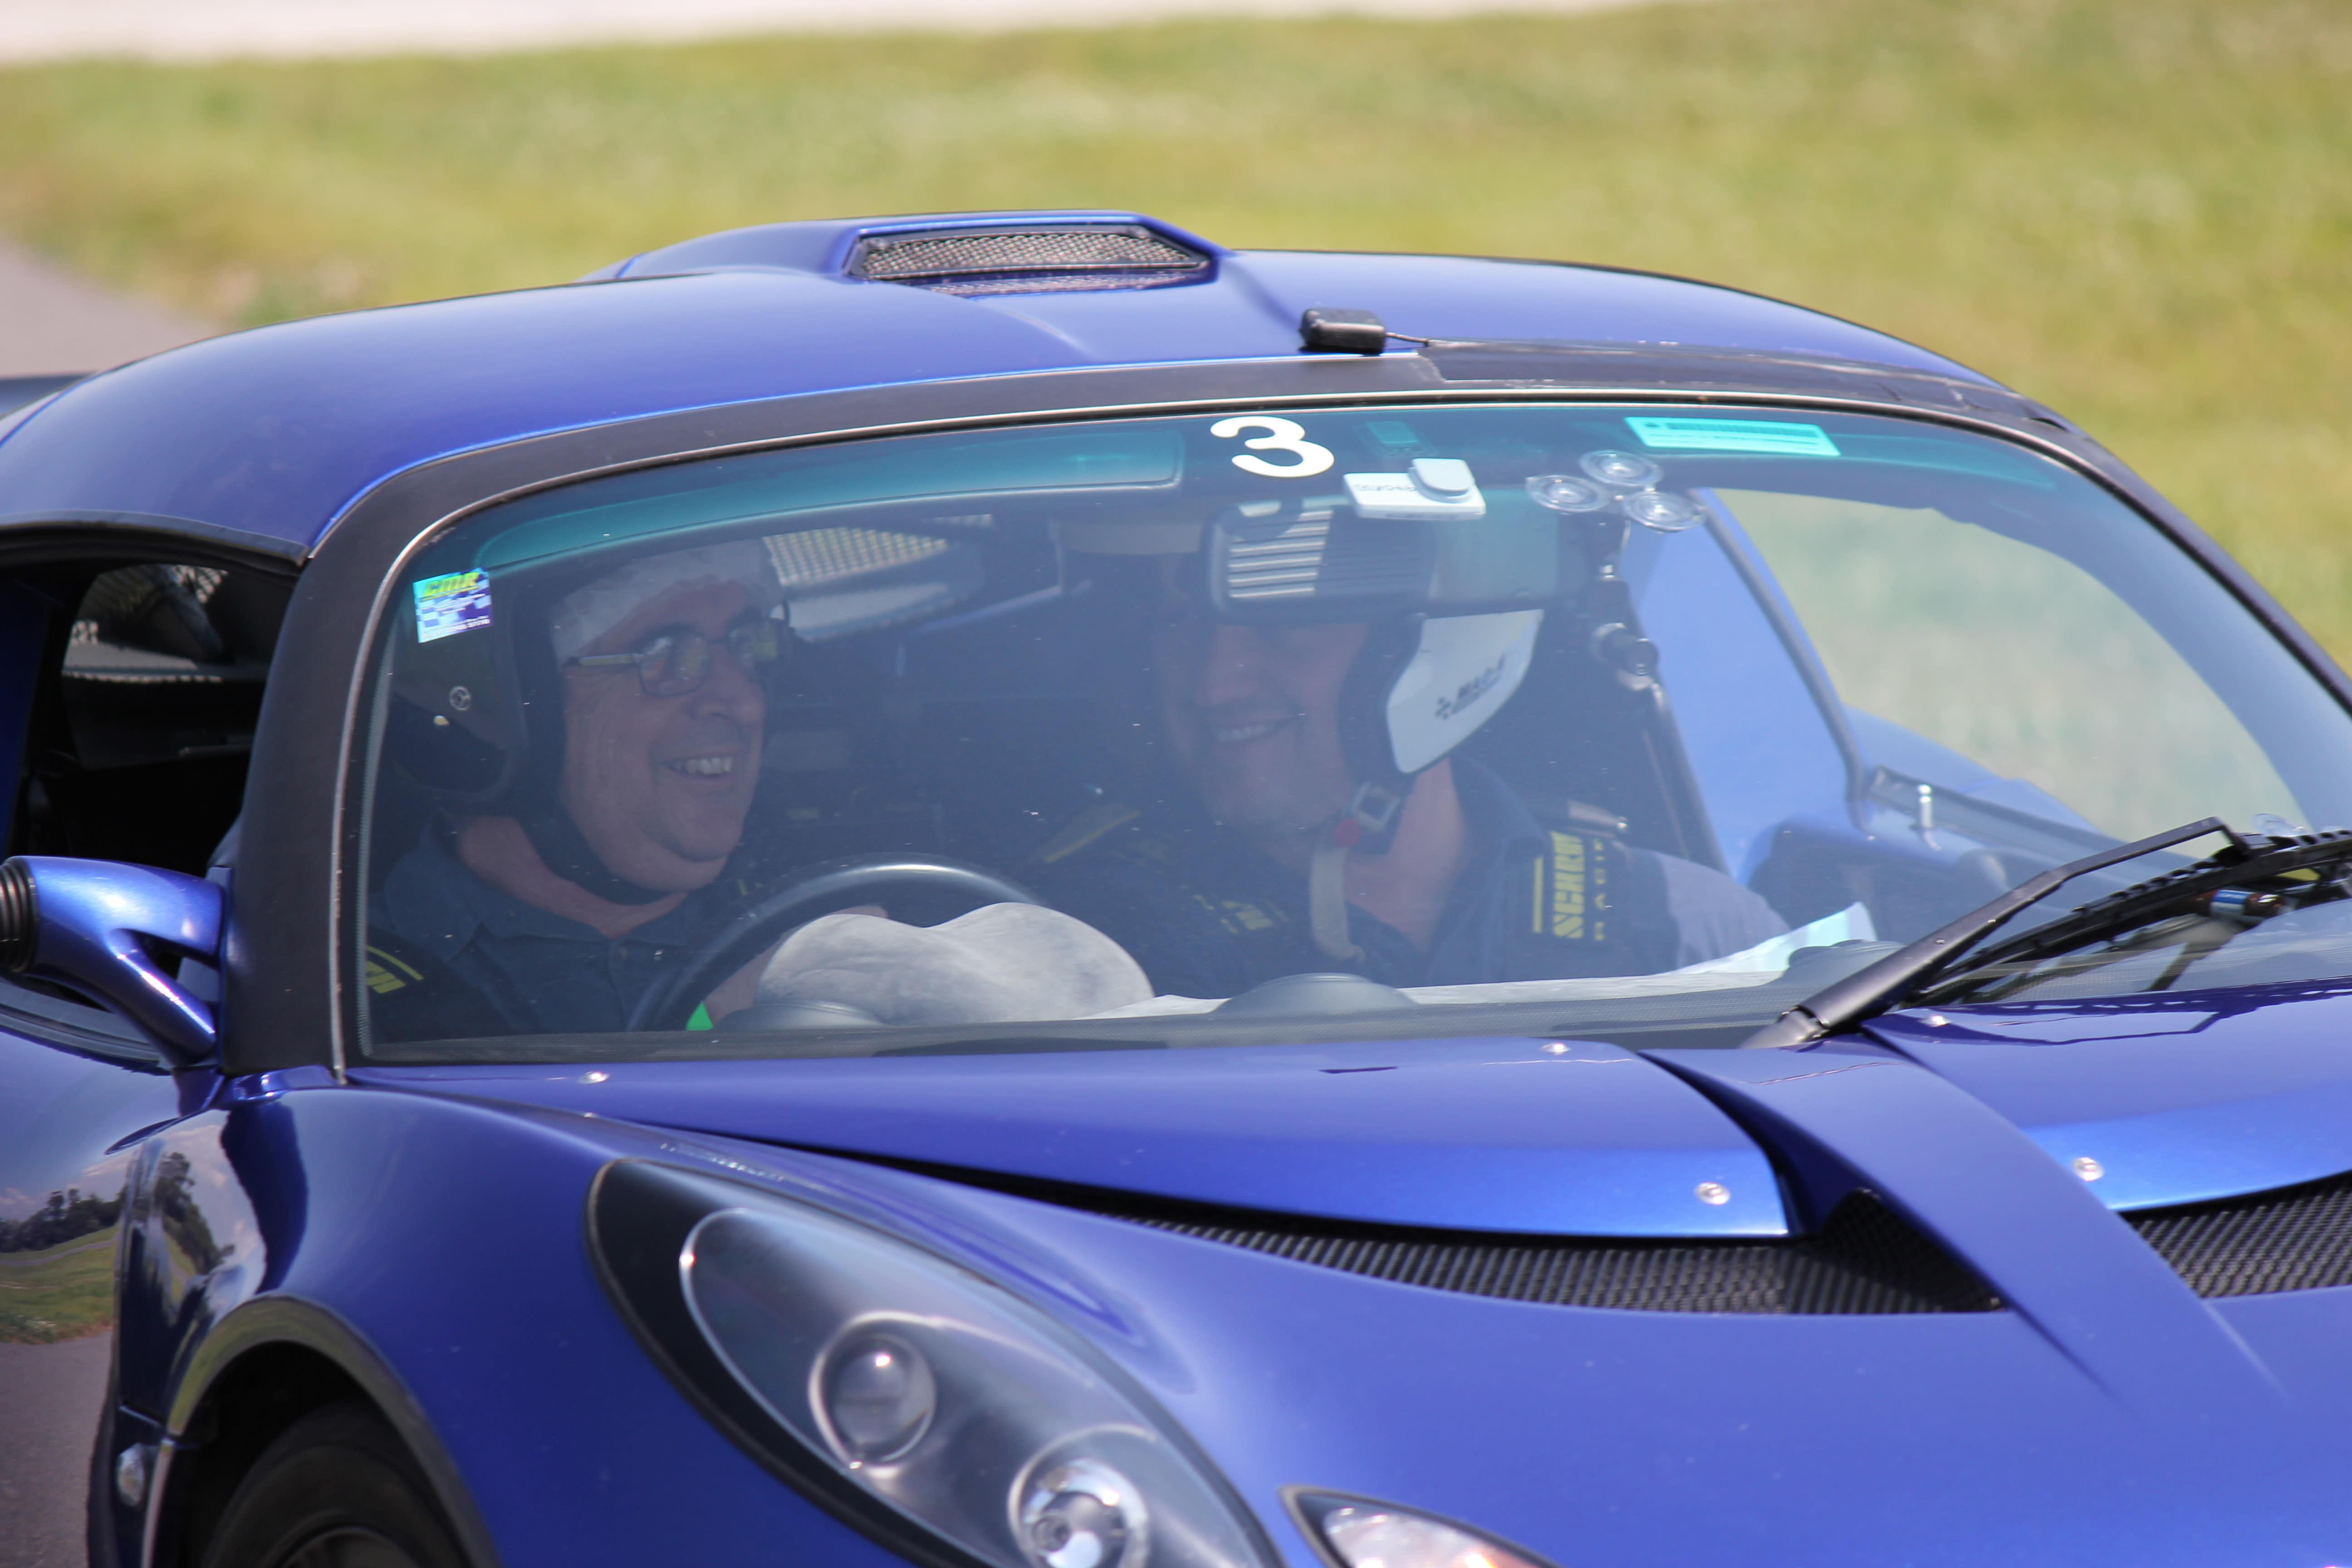 Lotus Exige Race Experience Full Day - Queensland Raceway